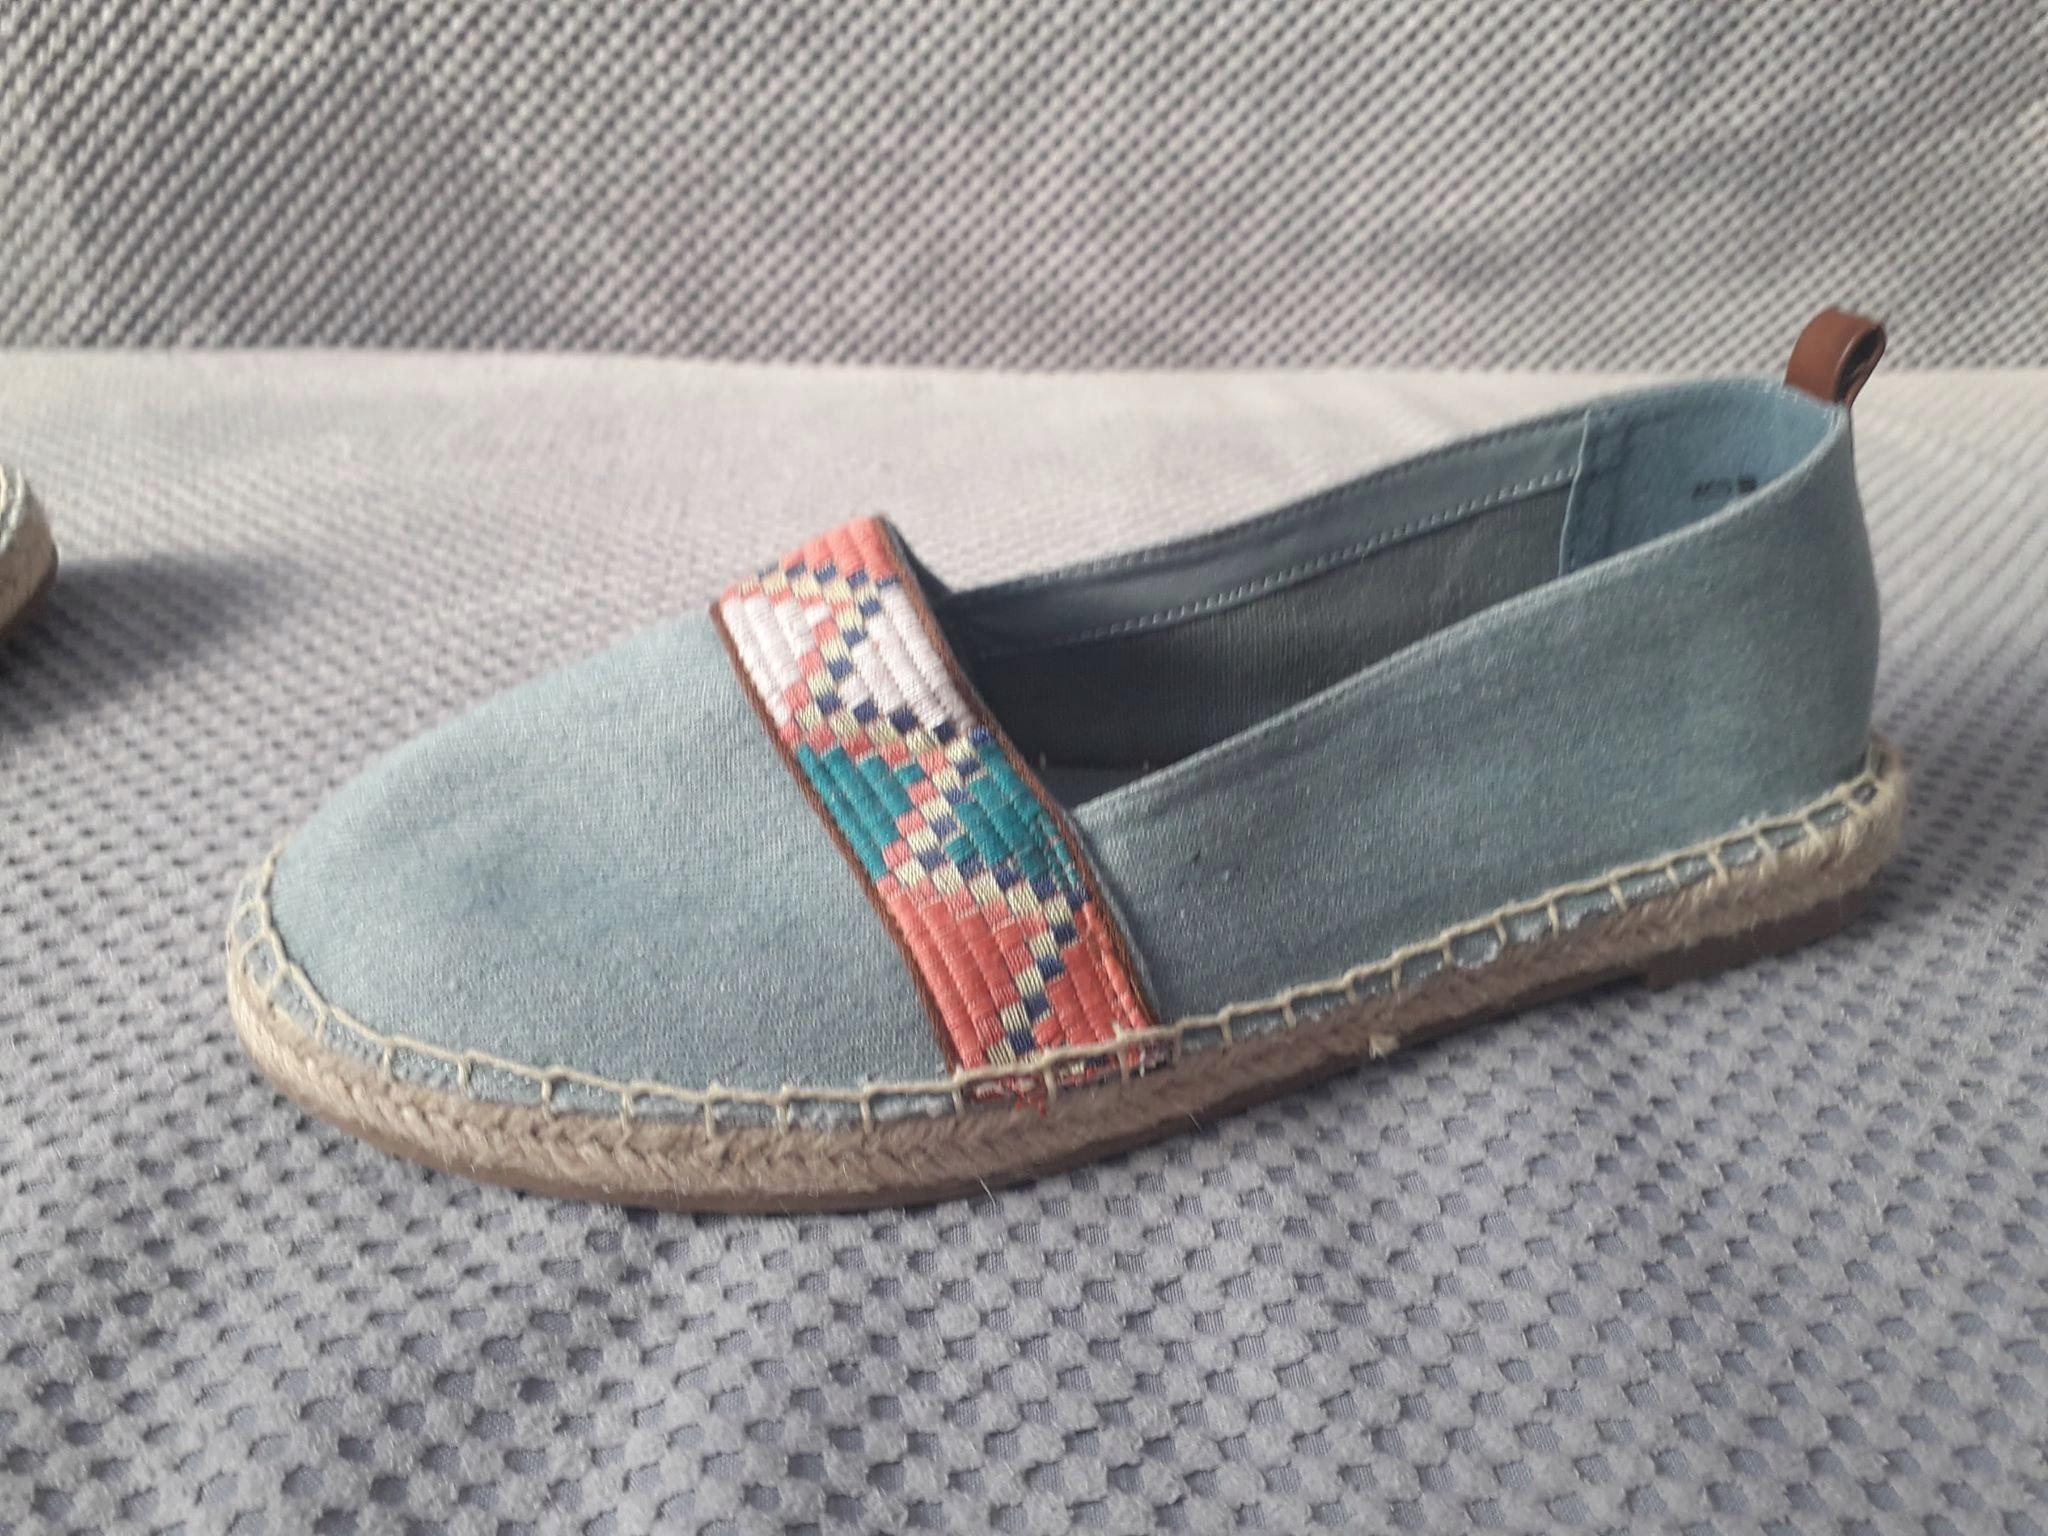 Buty Espadryle dżins azteckie 41 Deichmann